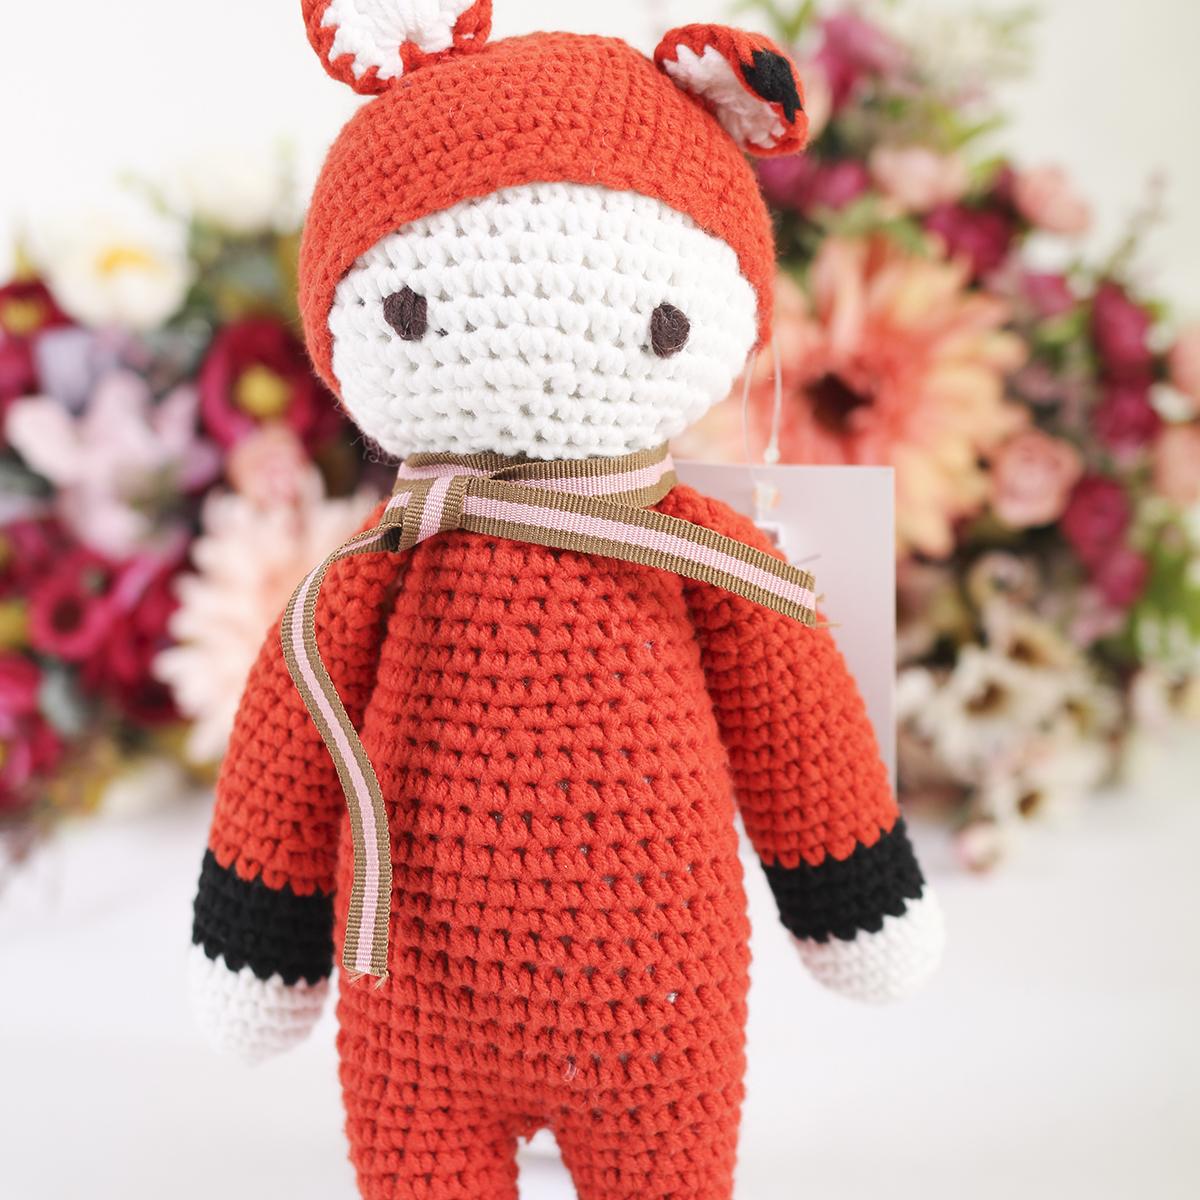 Thu dan len handmade nguoi cao